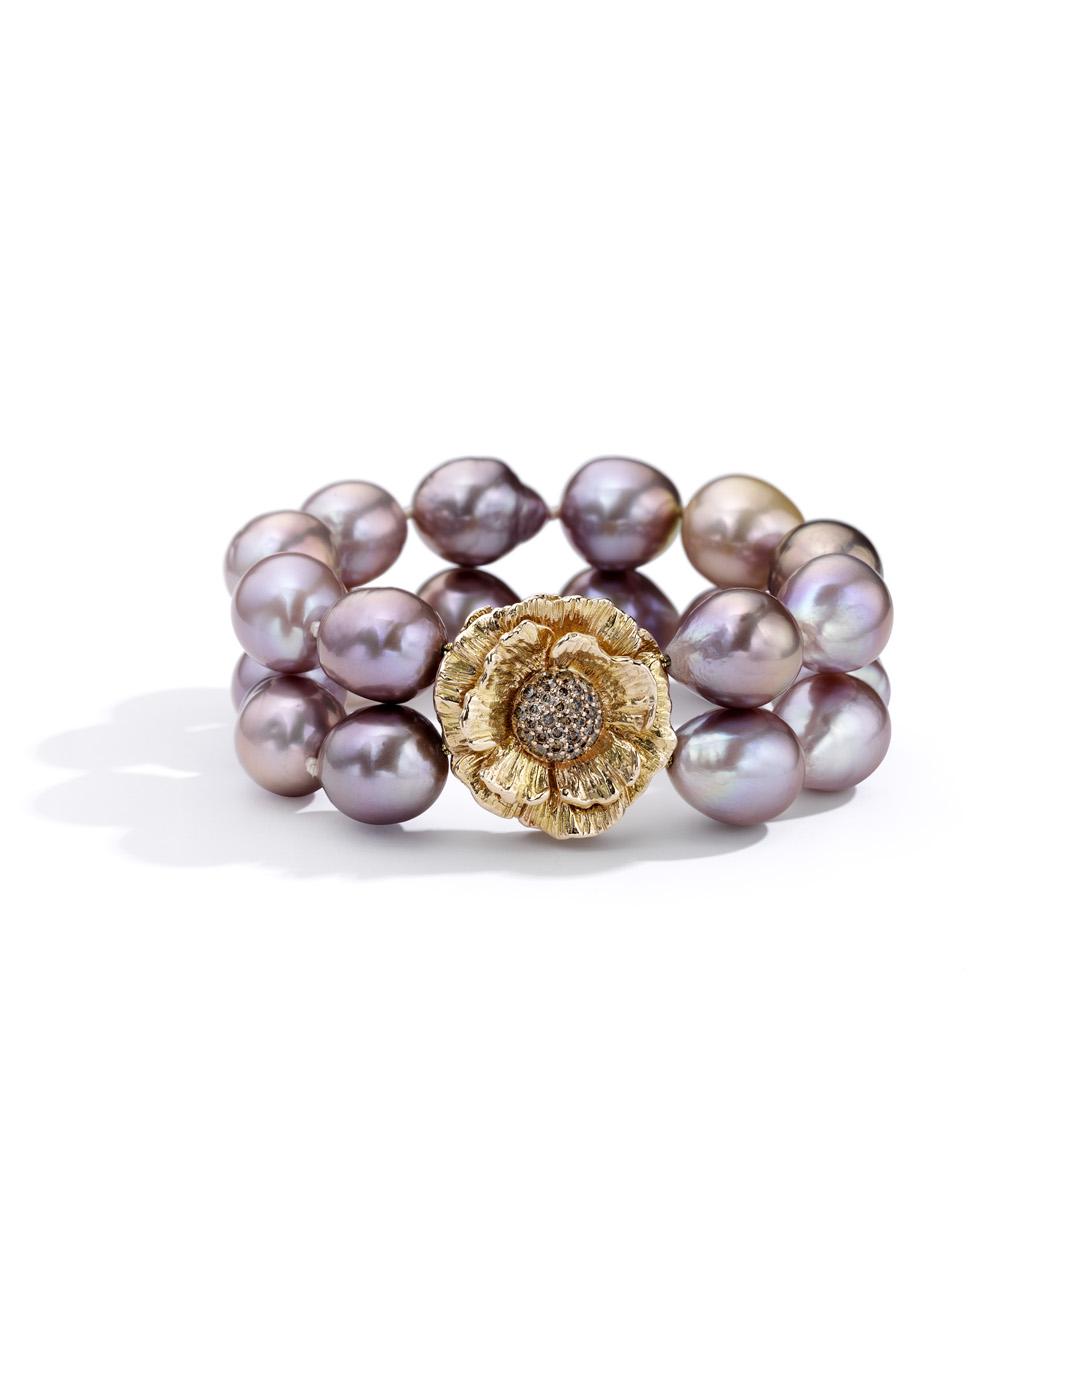 mish_jewelry_product_Poppy-Clasp-BR-3